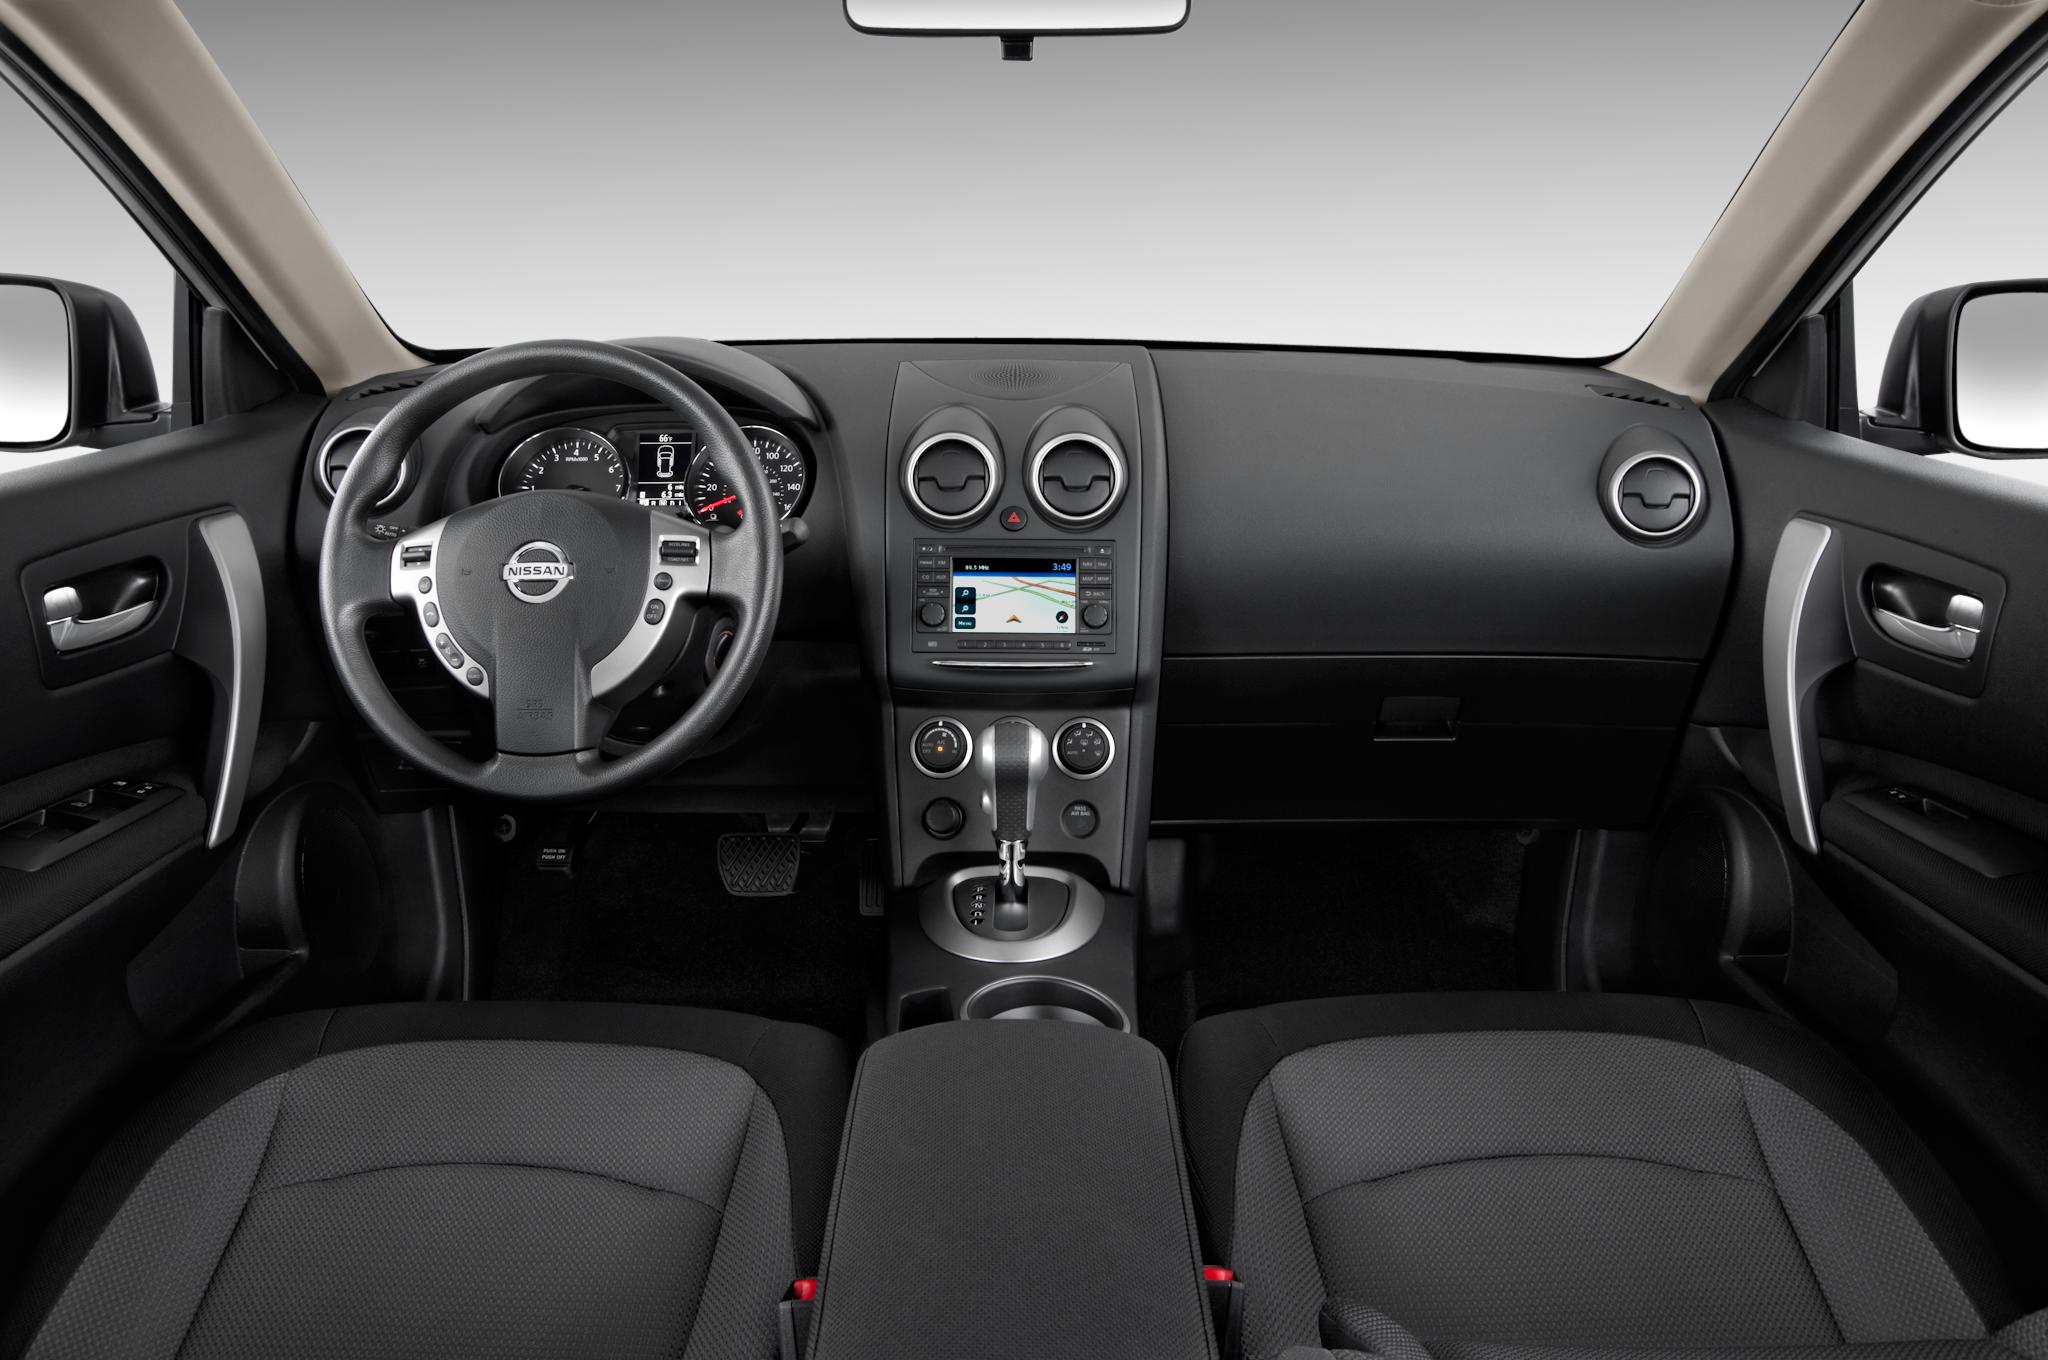 Nissan Rogue I 2007 - 2010 SUV 5 door #2